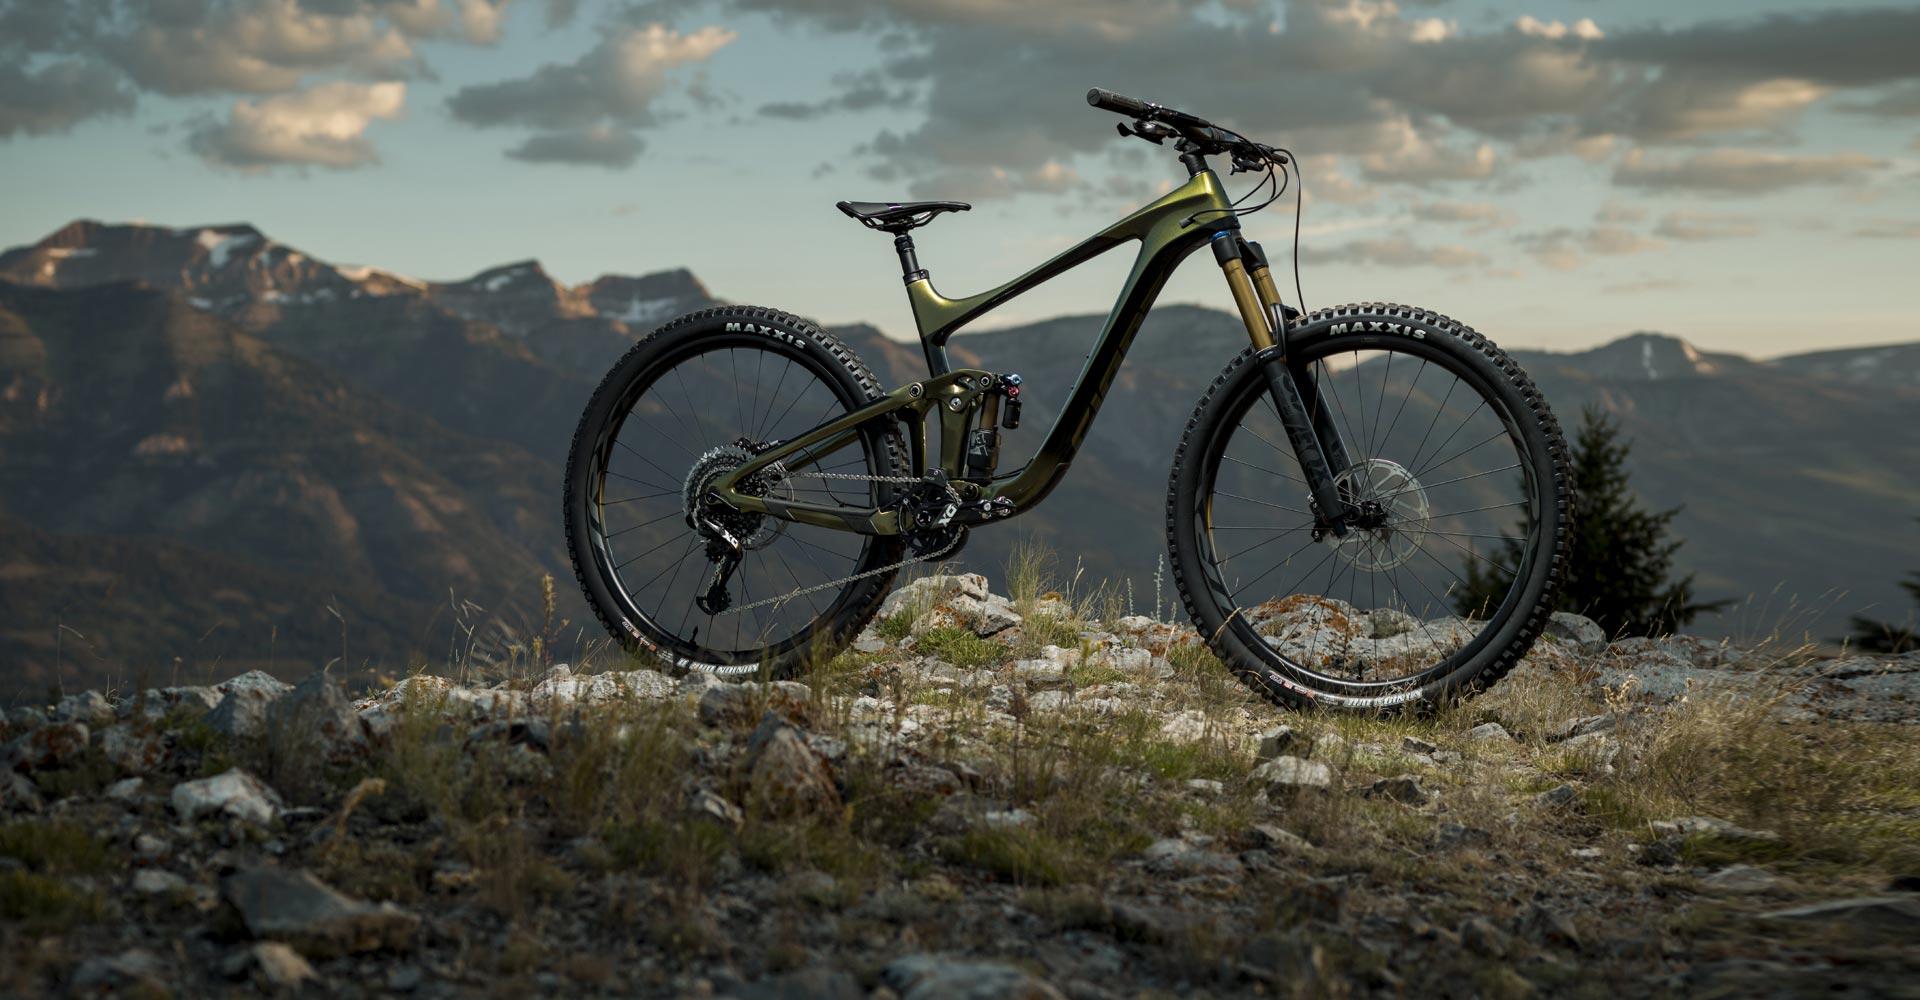 Giant's New Reign Models Come Ready for Enduro or Super-Enduro - Singletracks Mountain Bike News